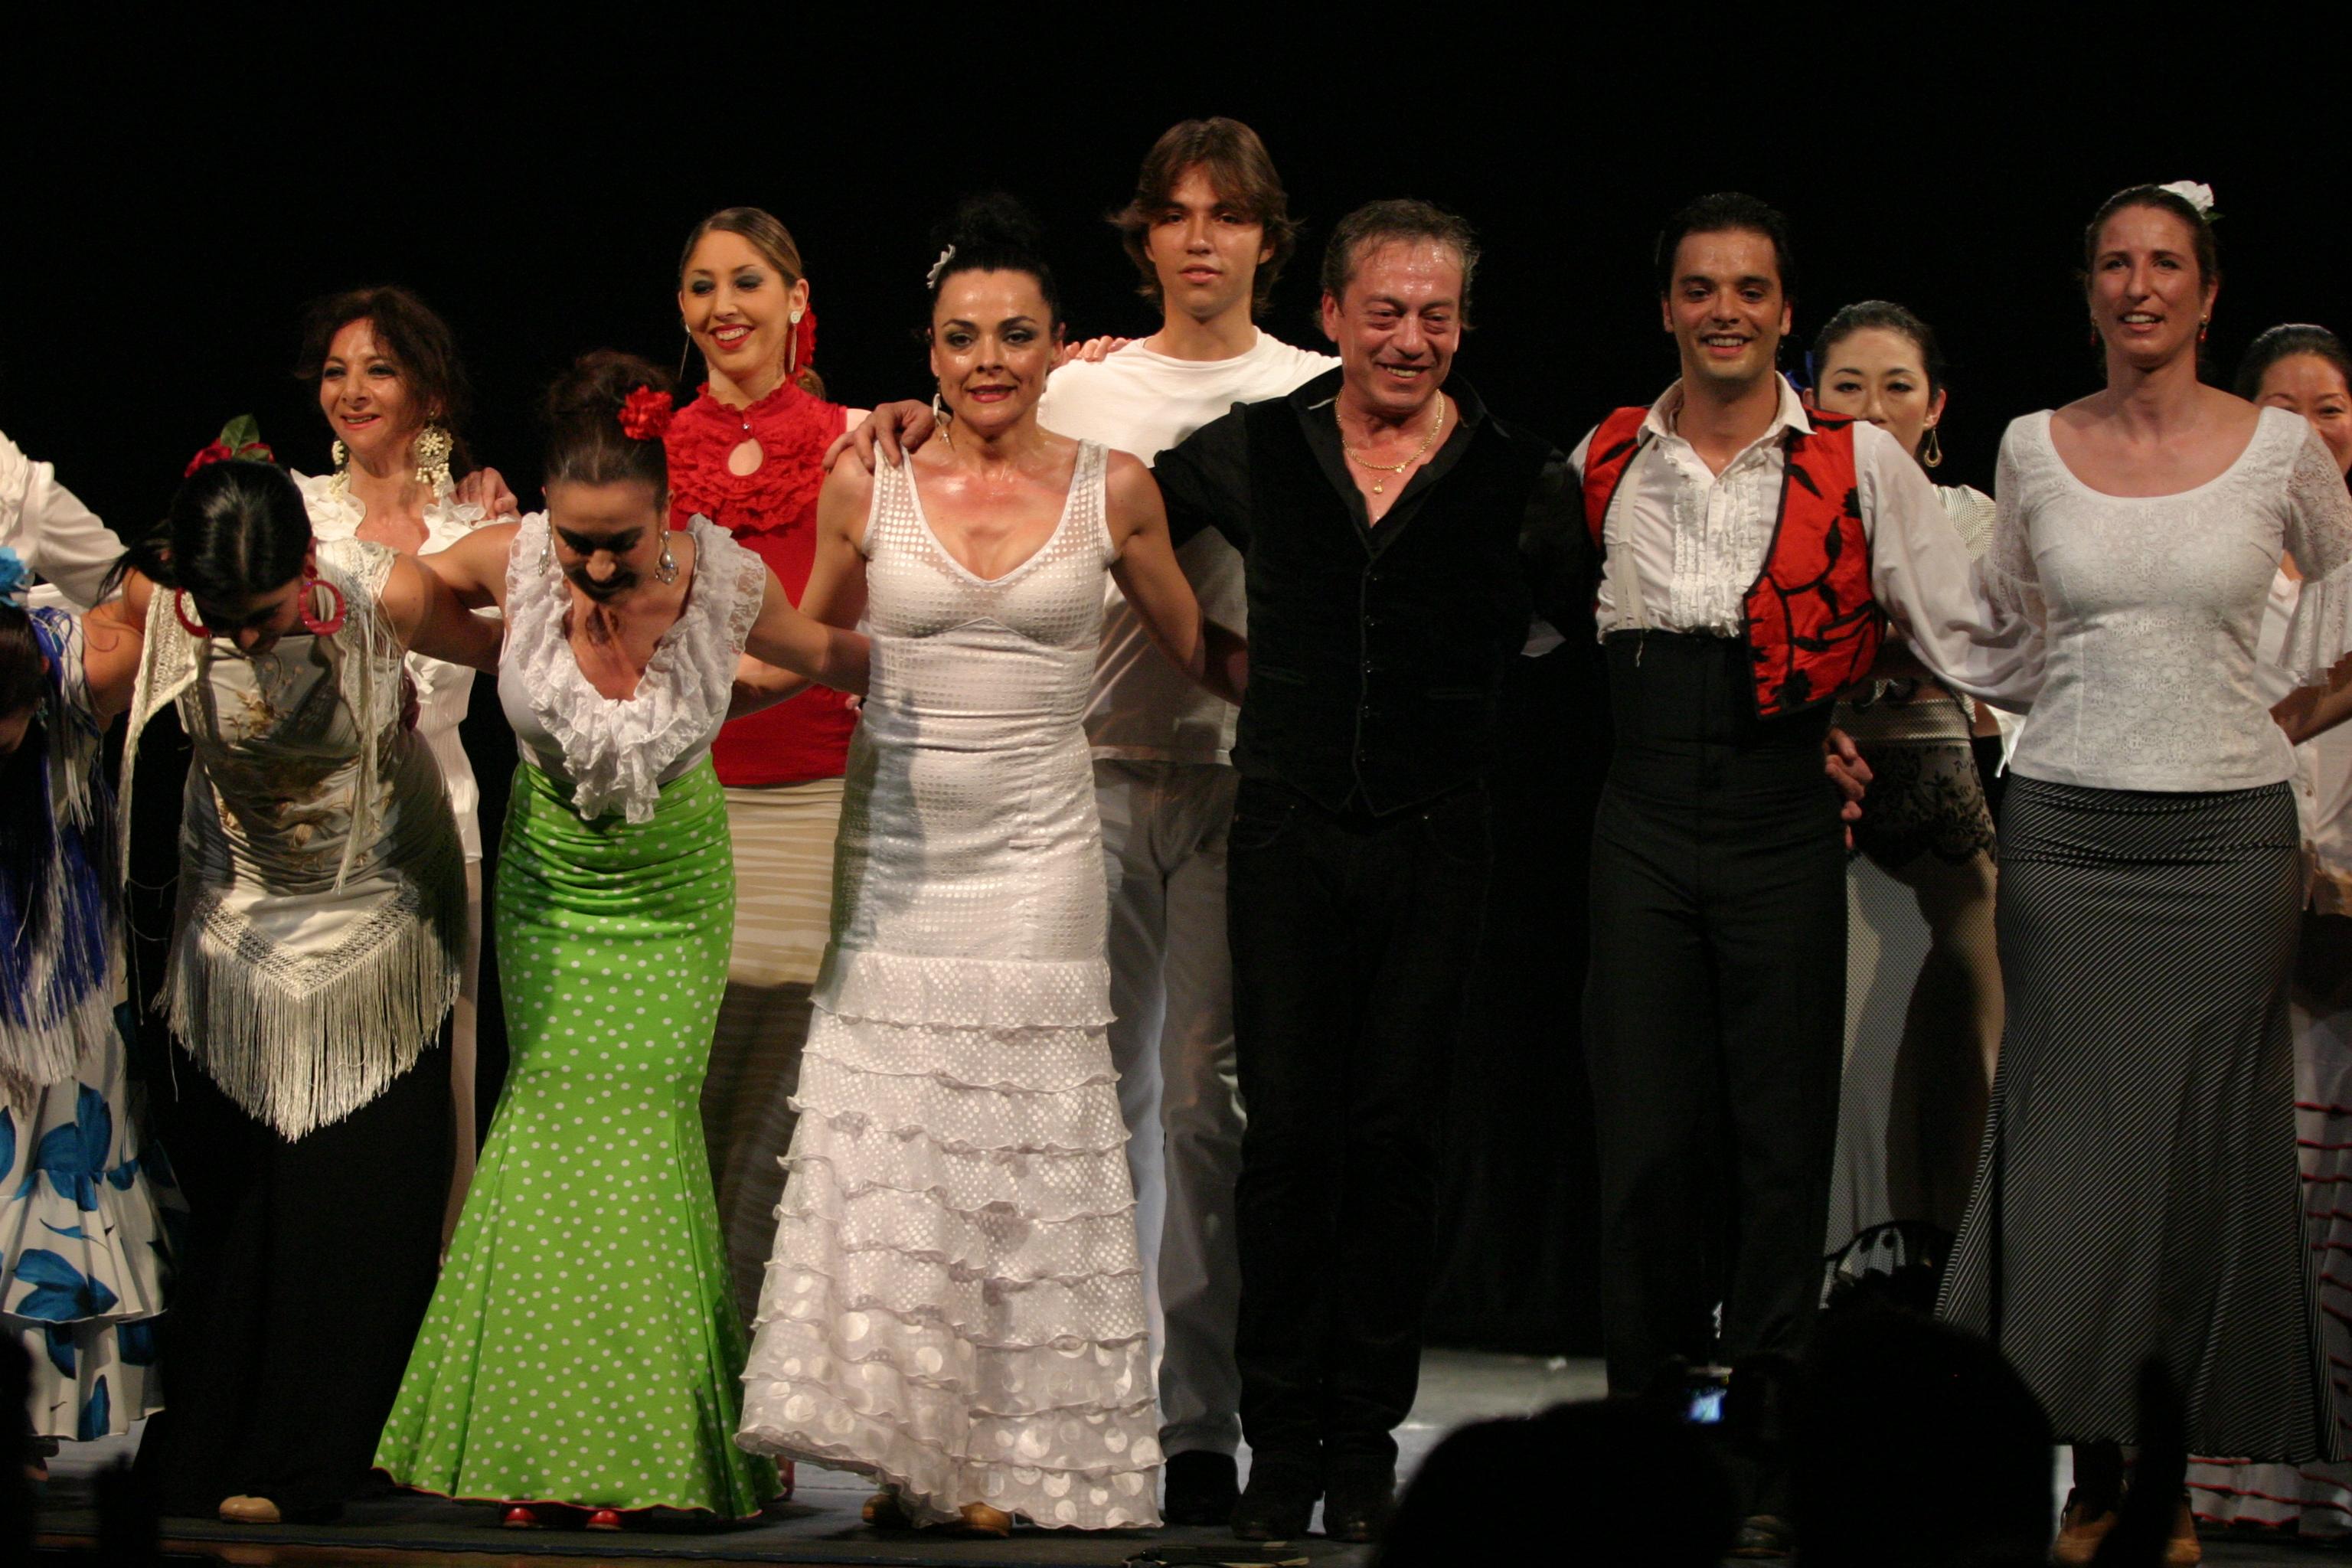 Anamarga_festivalJerez_2012_cursoJavierLatorre_01